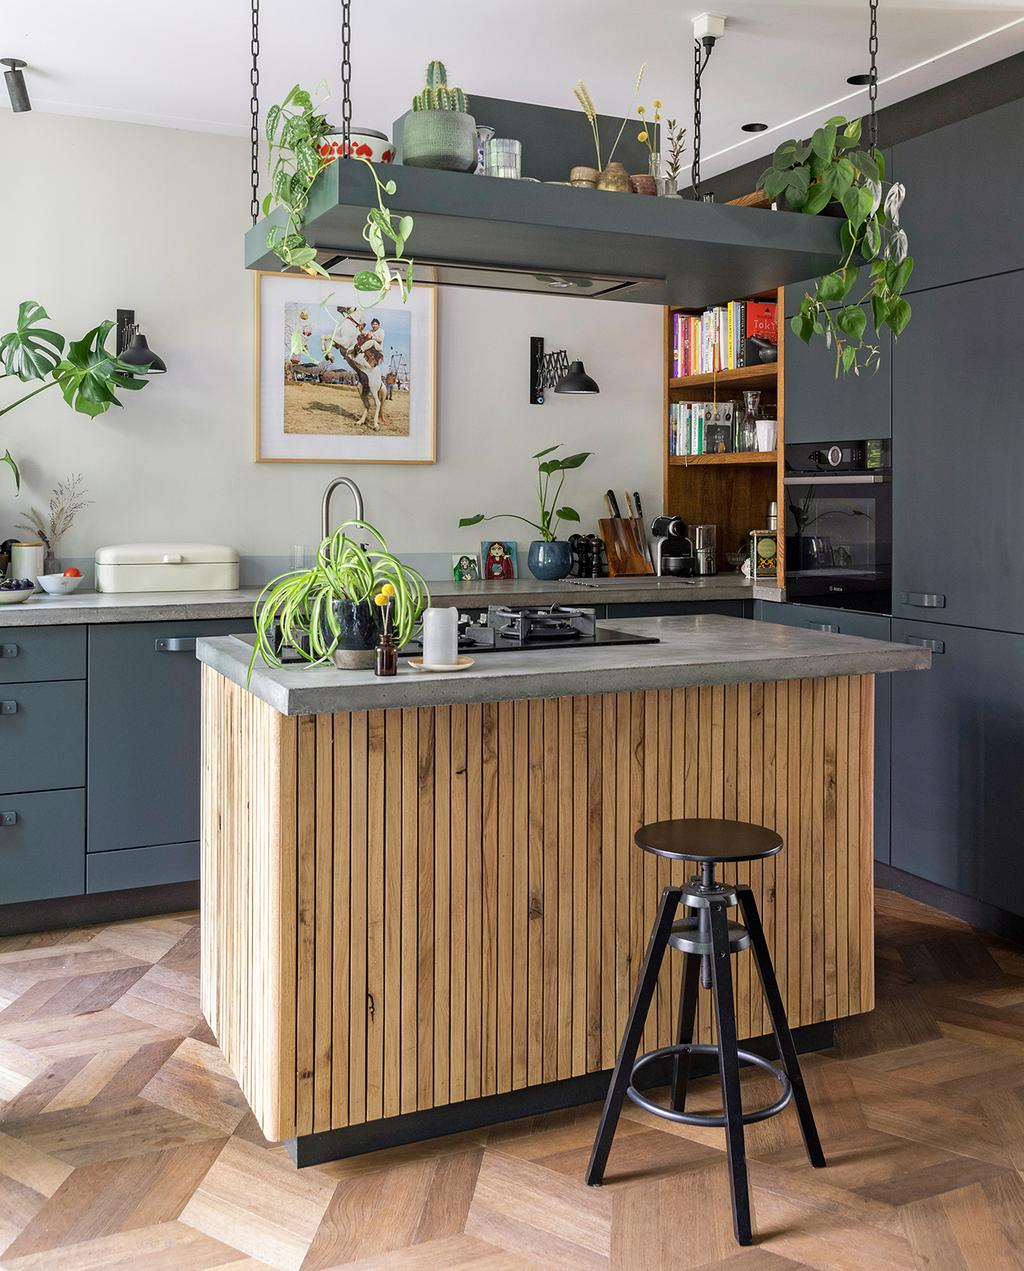 vtwonen 04-2020 | donker grijze keuken met hout accenten en zwarte barkruk Amsterdam